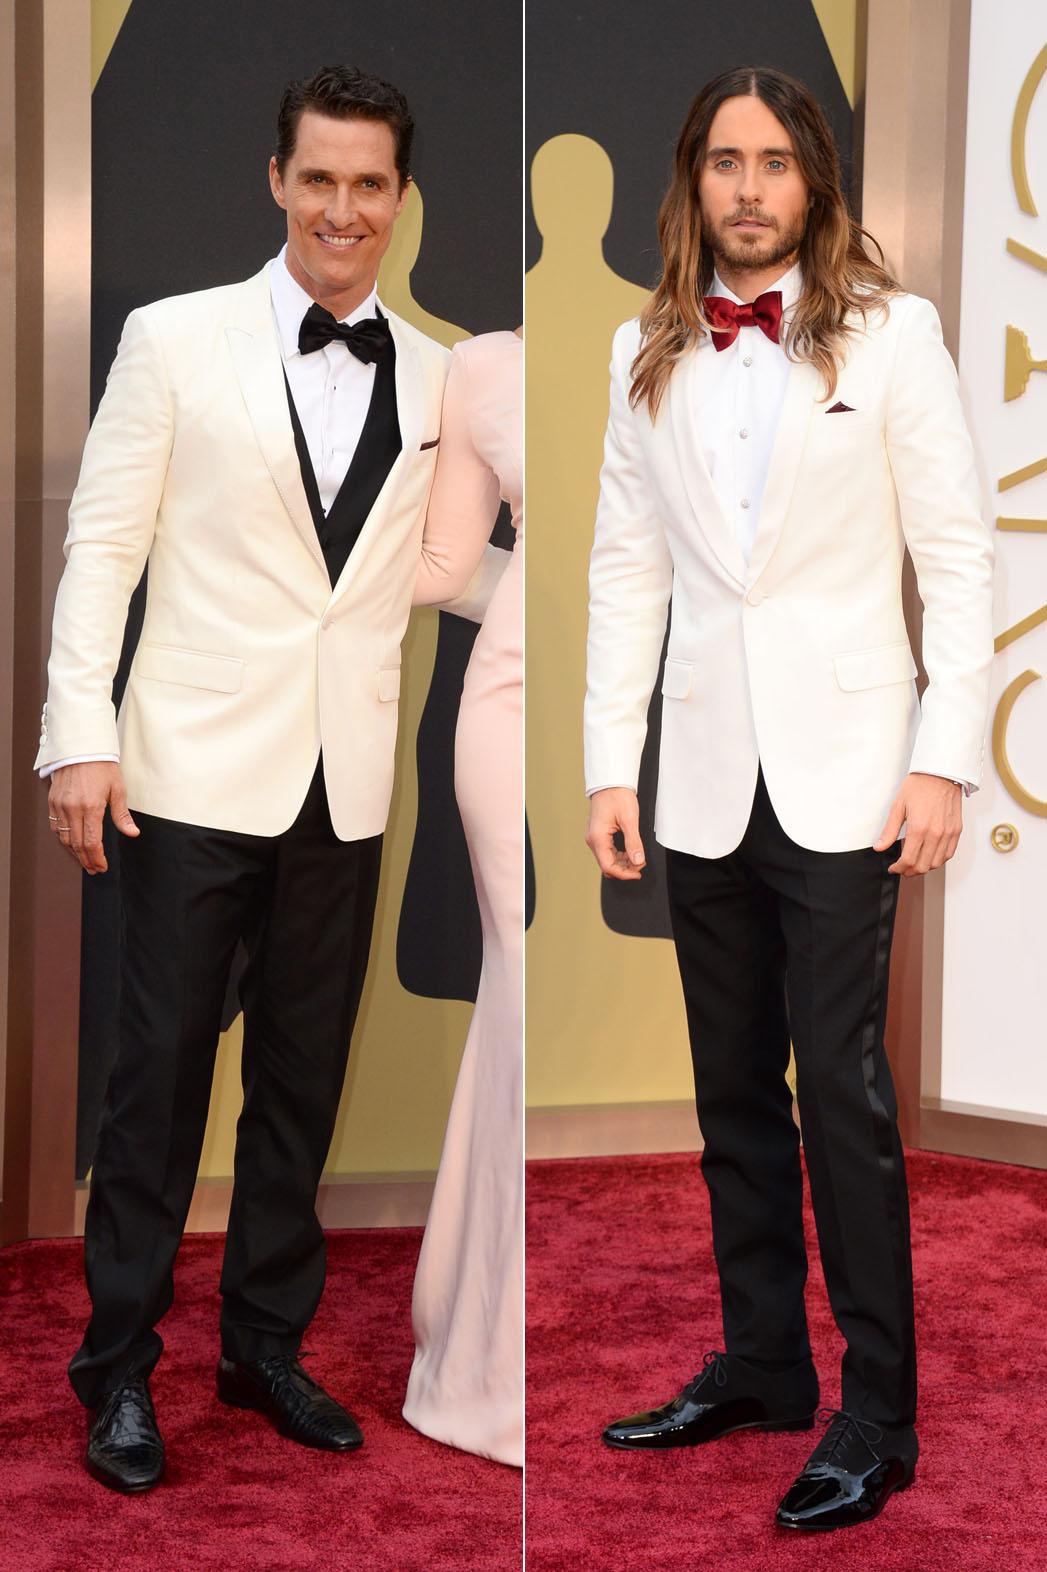 Jared Leto Oscars Red Carpet